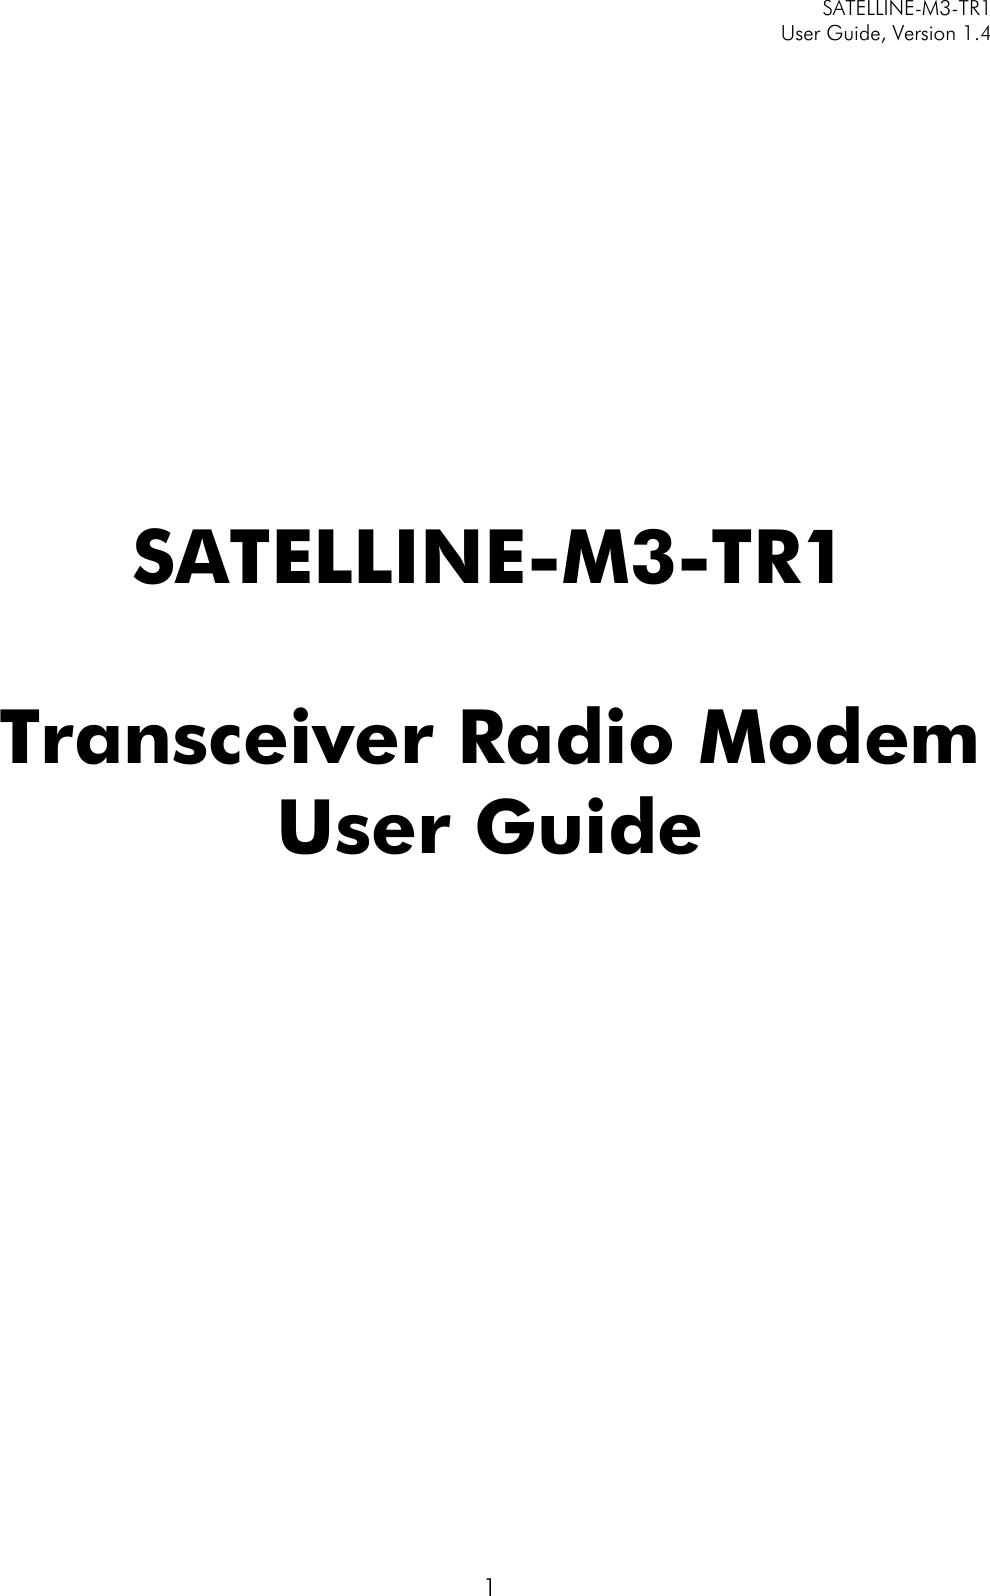 Satel SATEL-TA13 SATELLINE-M3-TR1 User Manual SATELLINE M3